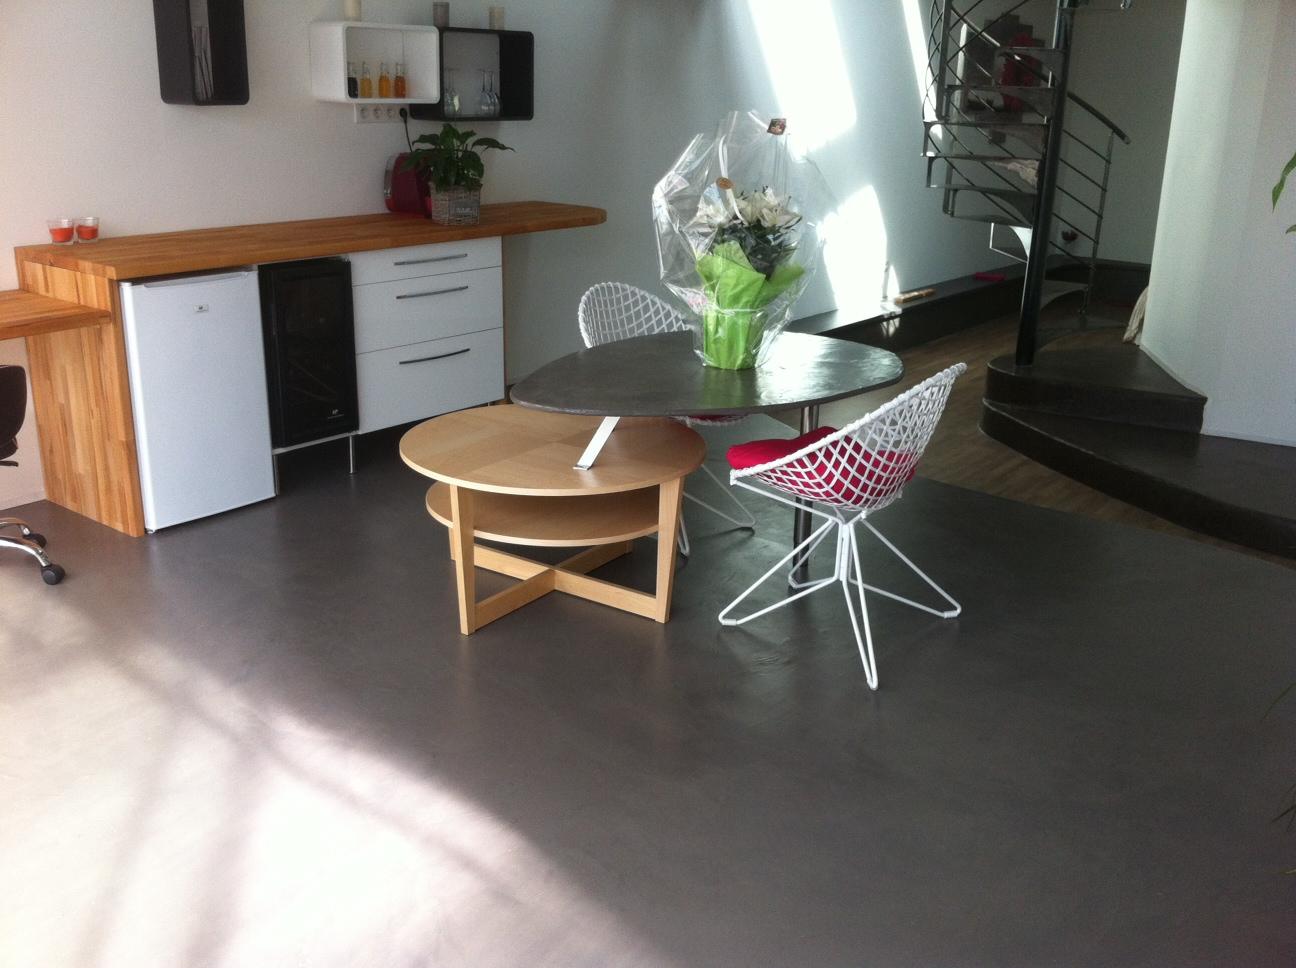 Enduit decoratif resine epoxy for Resine epoxy pour beton